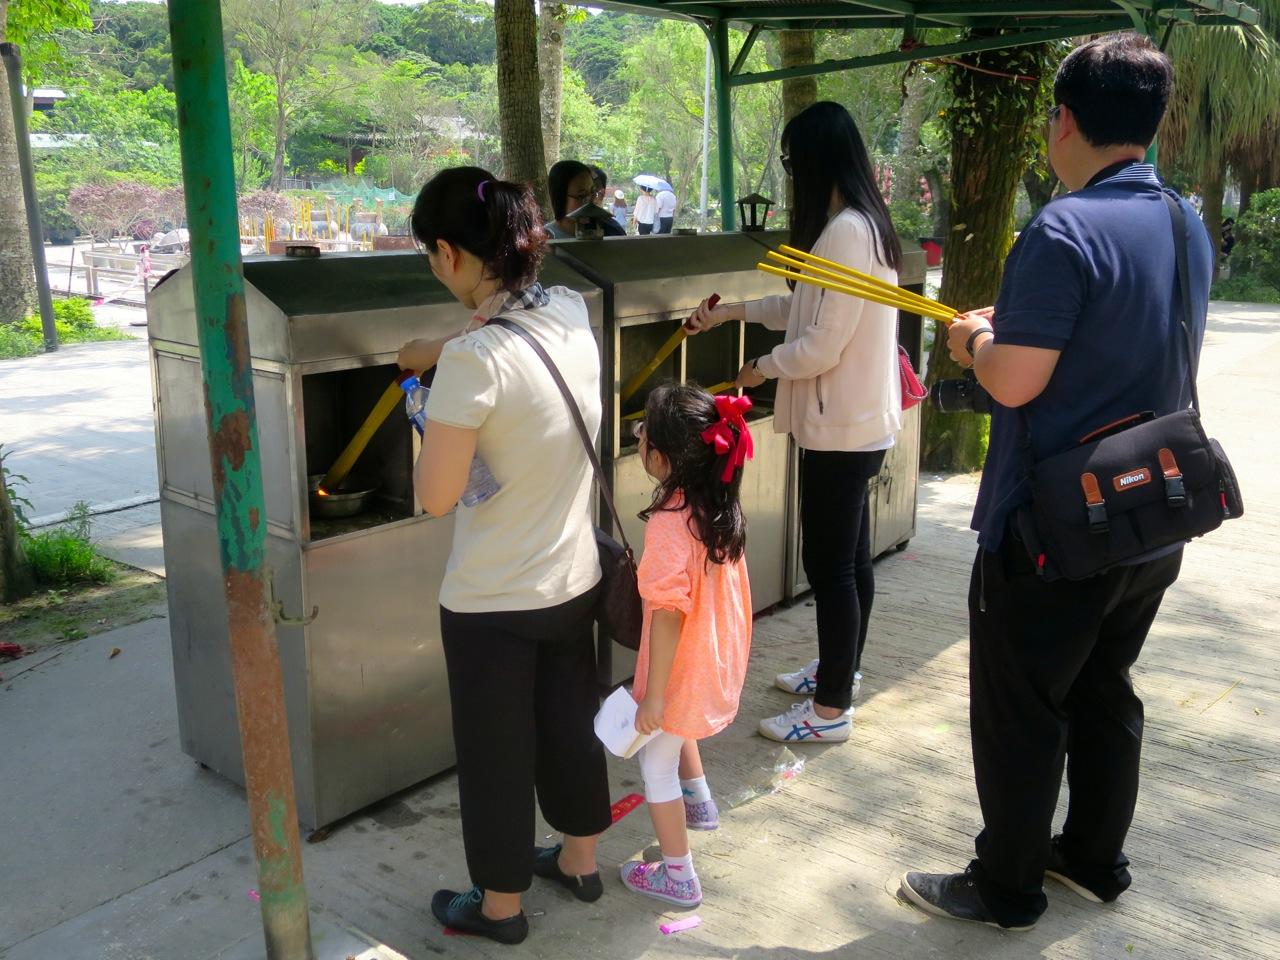 Hong Kong 3 23